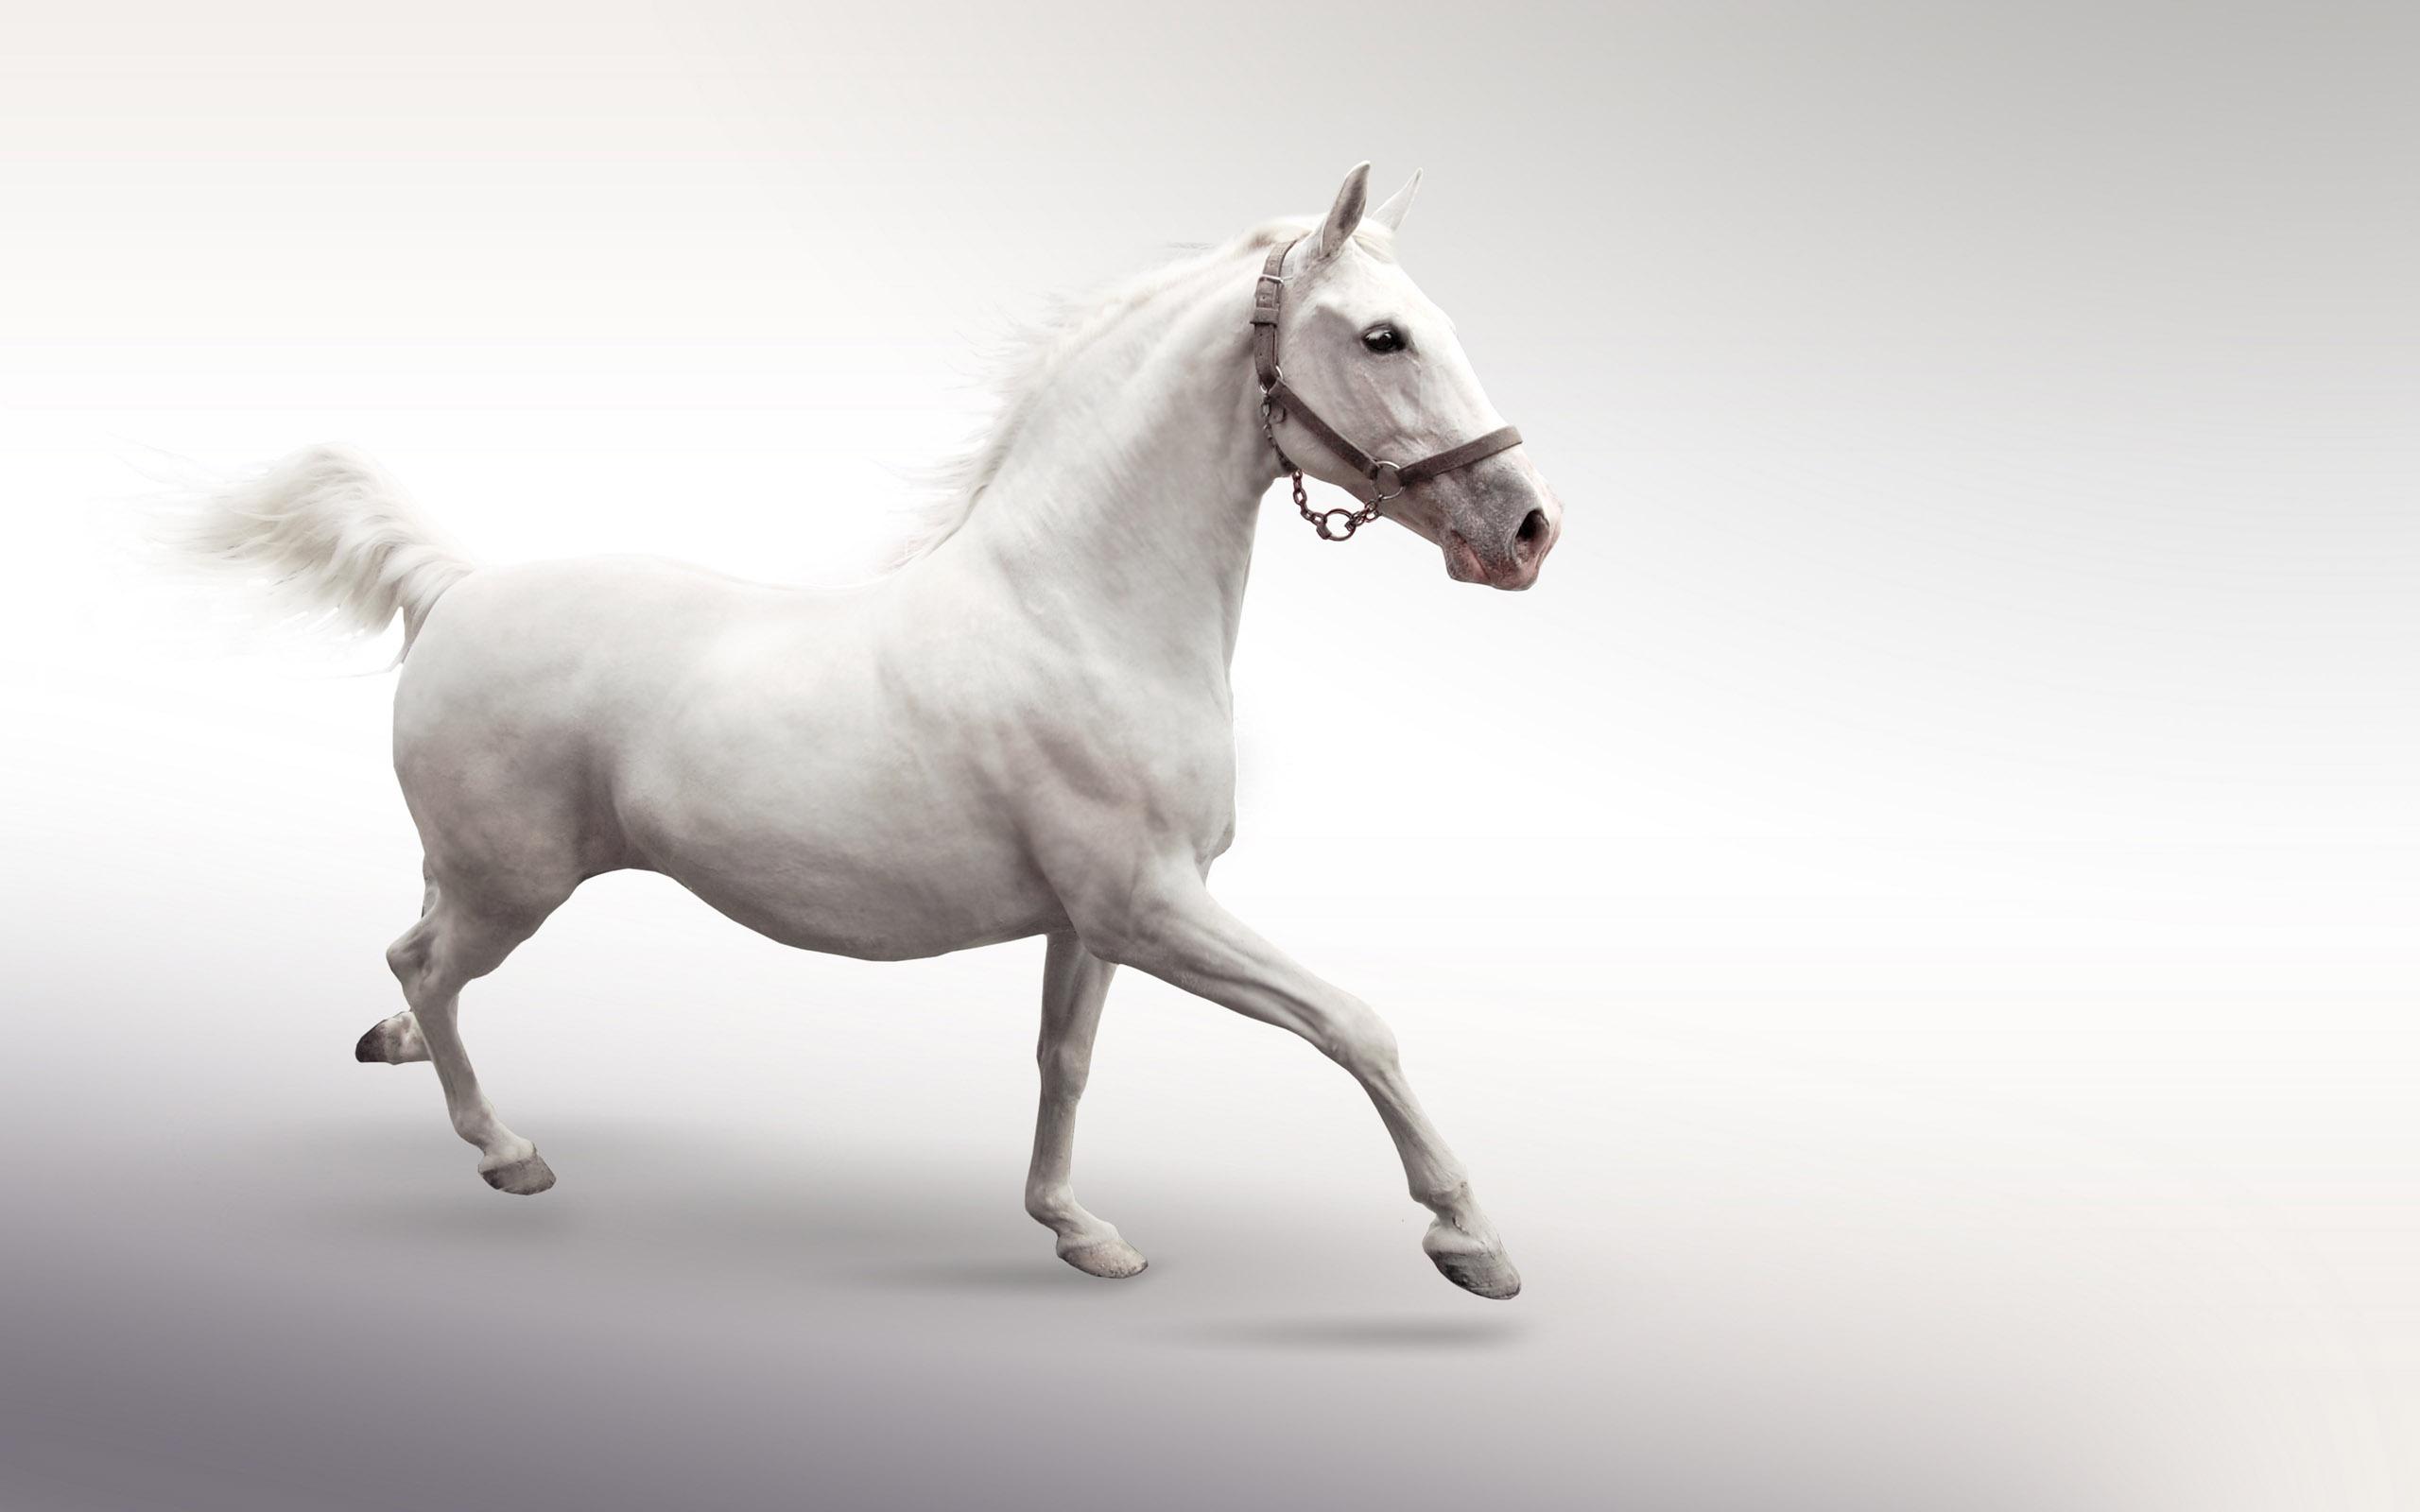 white horse 25698 2560x1600 px ~ hdwallsource